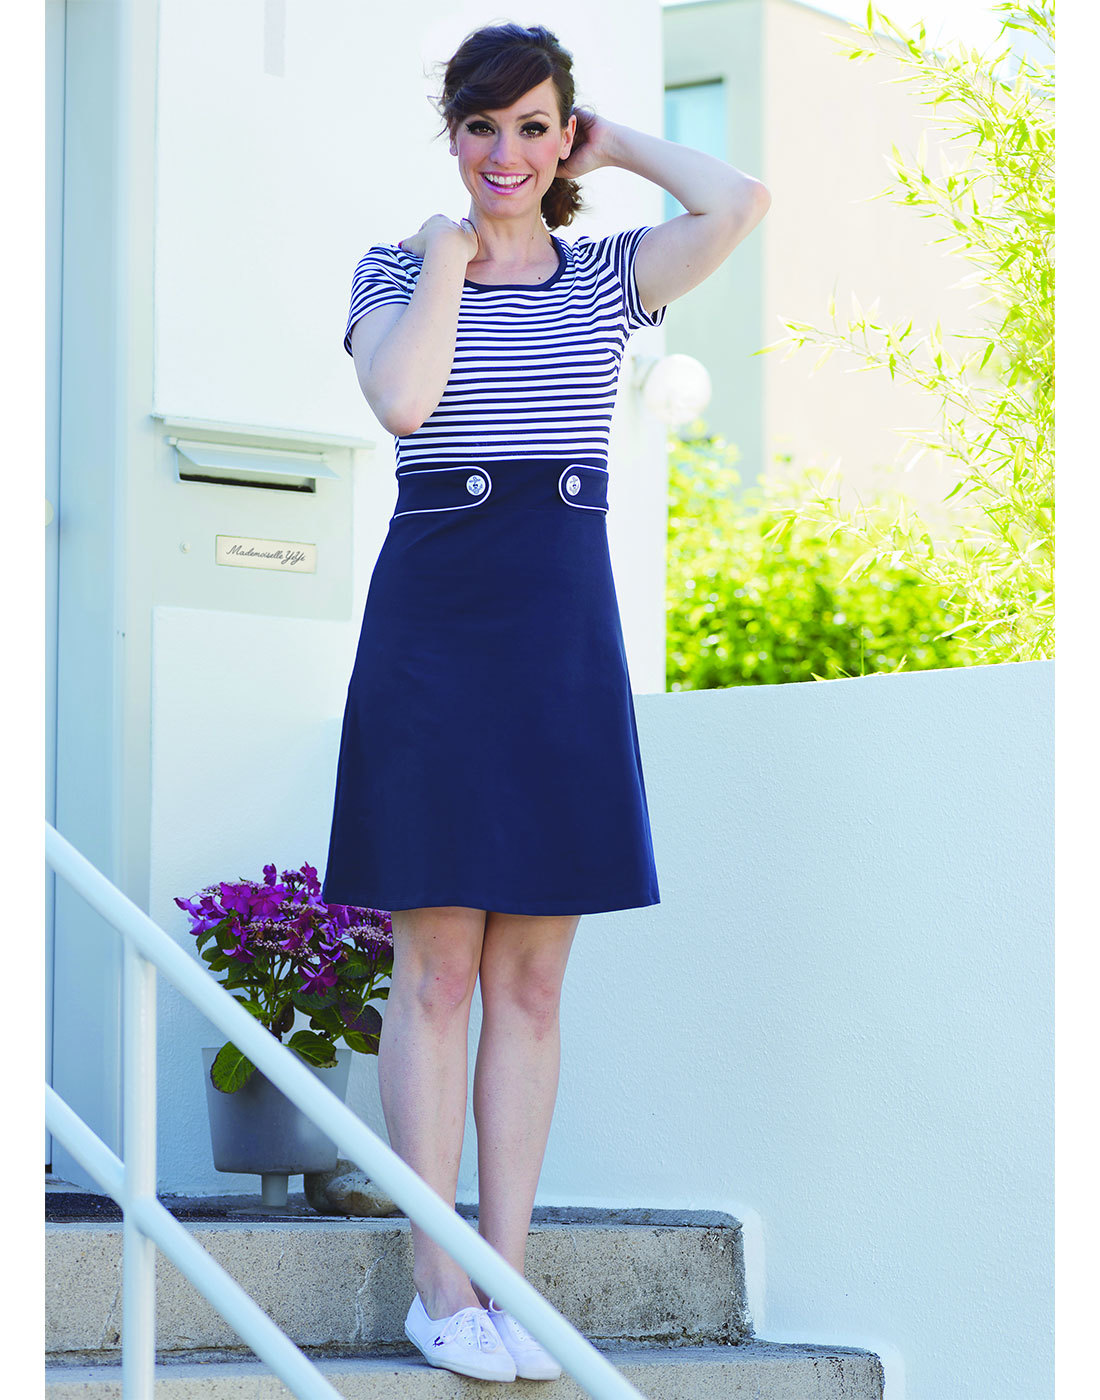 Isla MADEMOISELLE YEYE Retro 60s Stripe Mod Dress